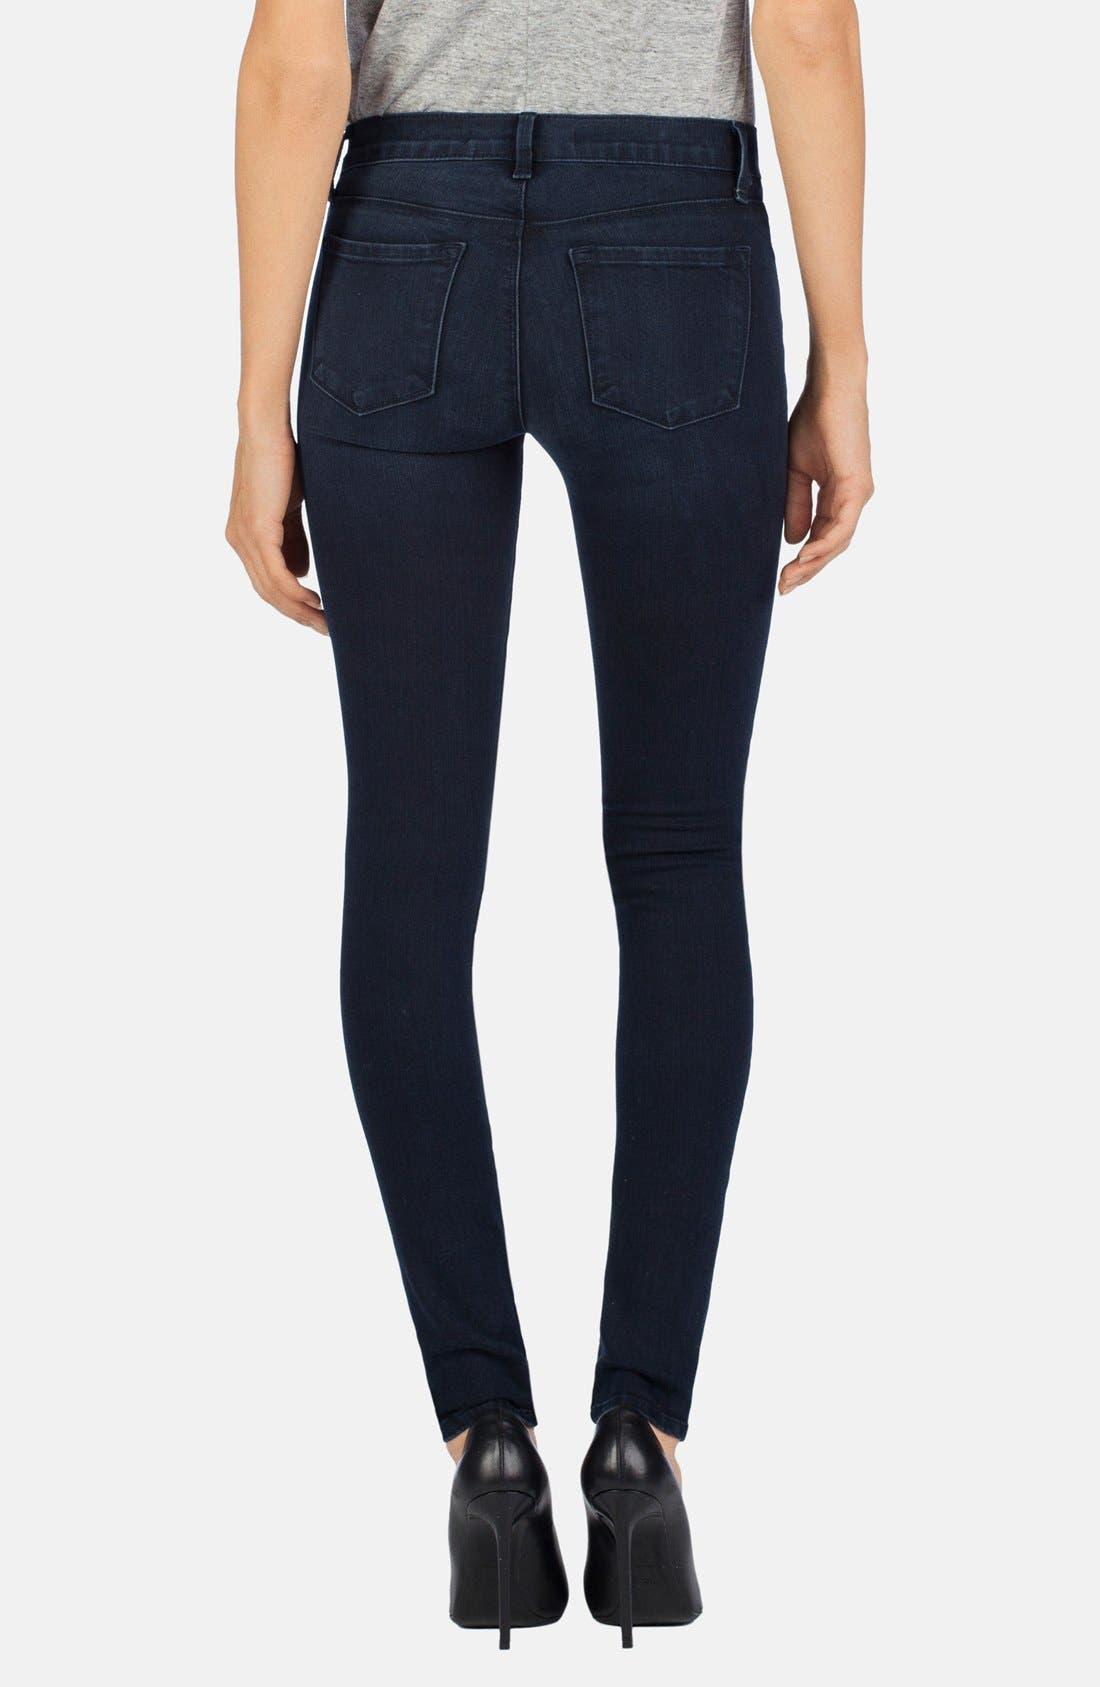 Alternate Image 2  - J Brand 'Willow' Moto Skinny Jeans (Verve)